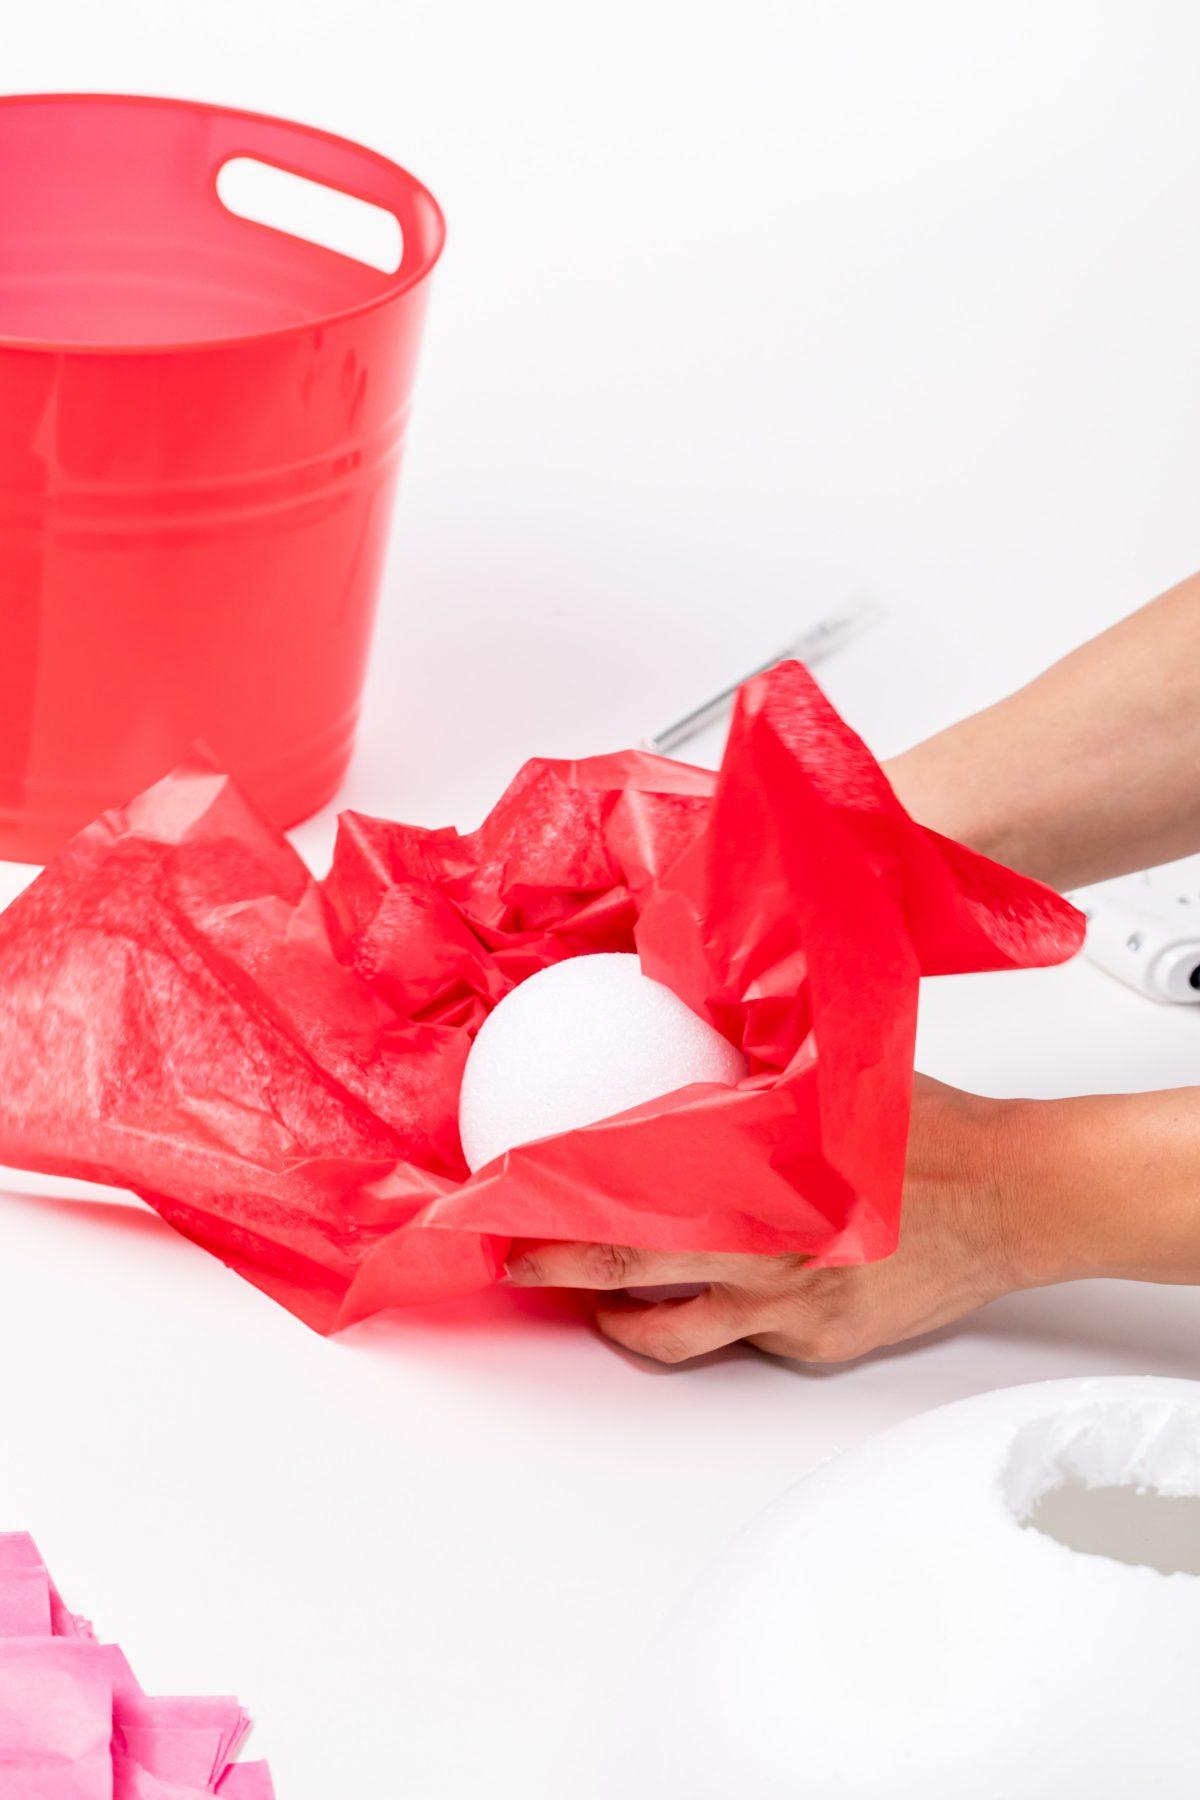 5D4B8107 - Cupcake Valentine Day Box - Wrap styrofoam ball